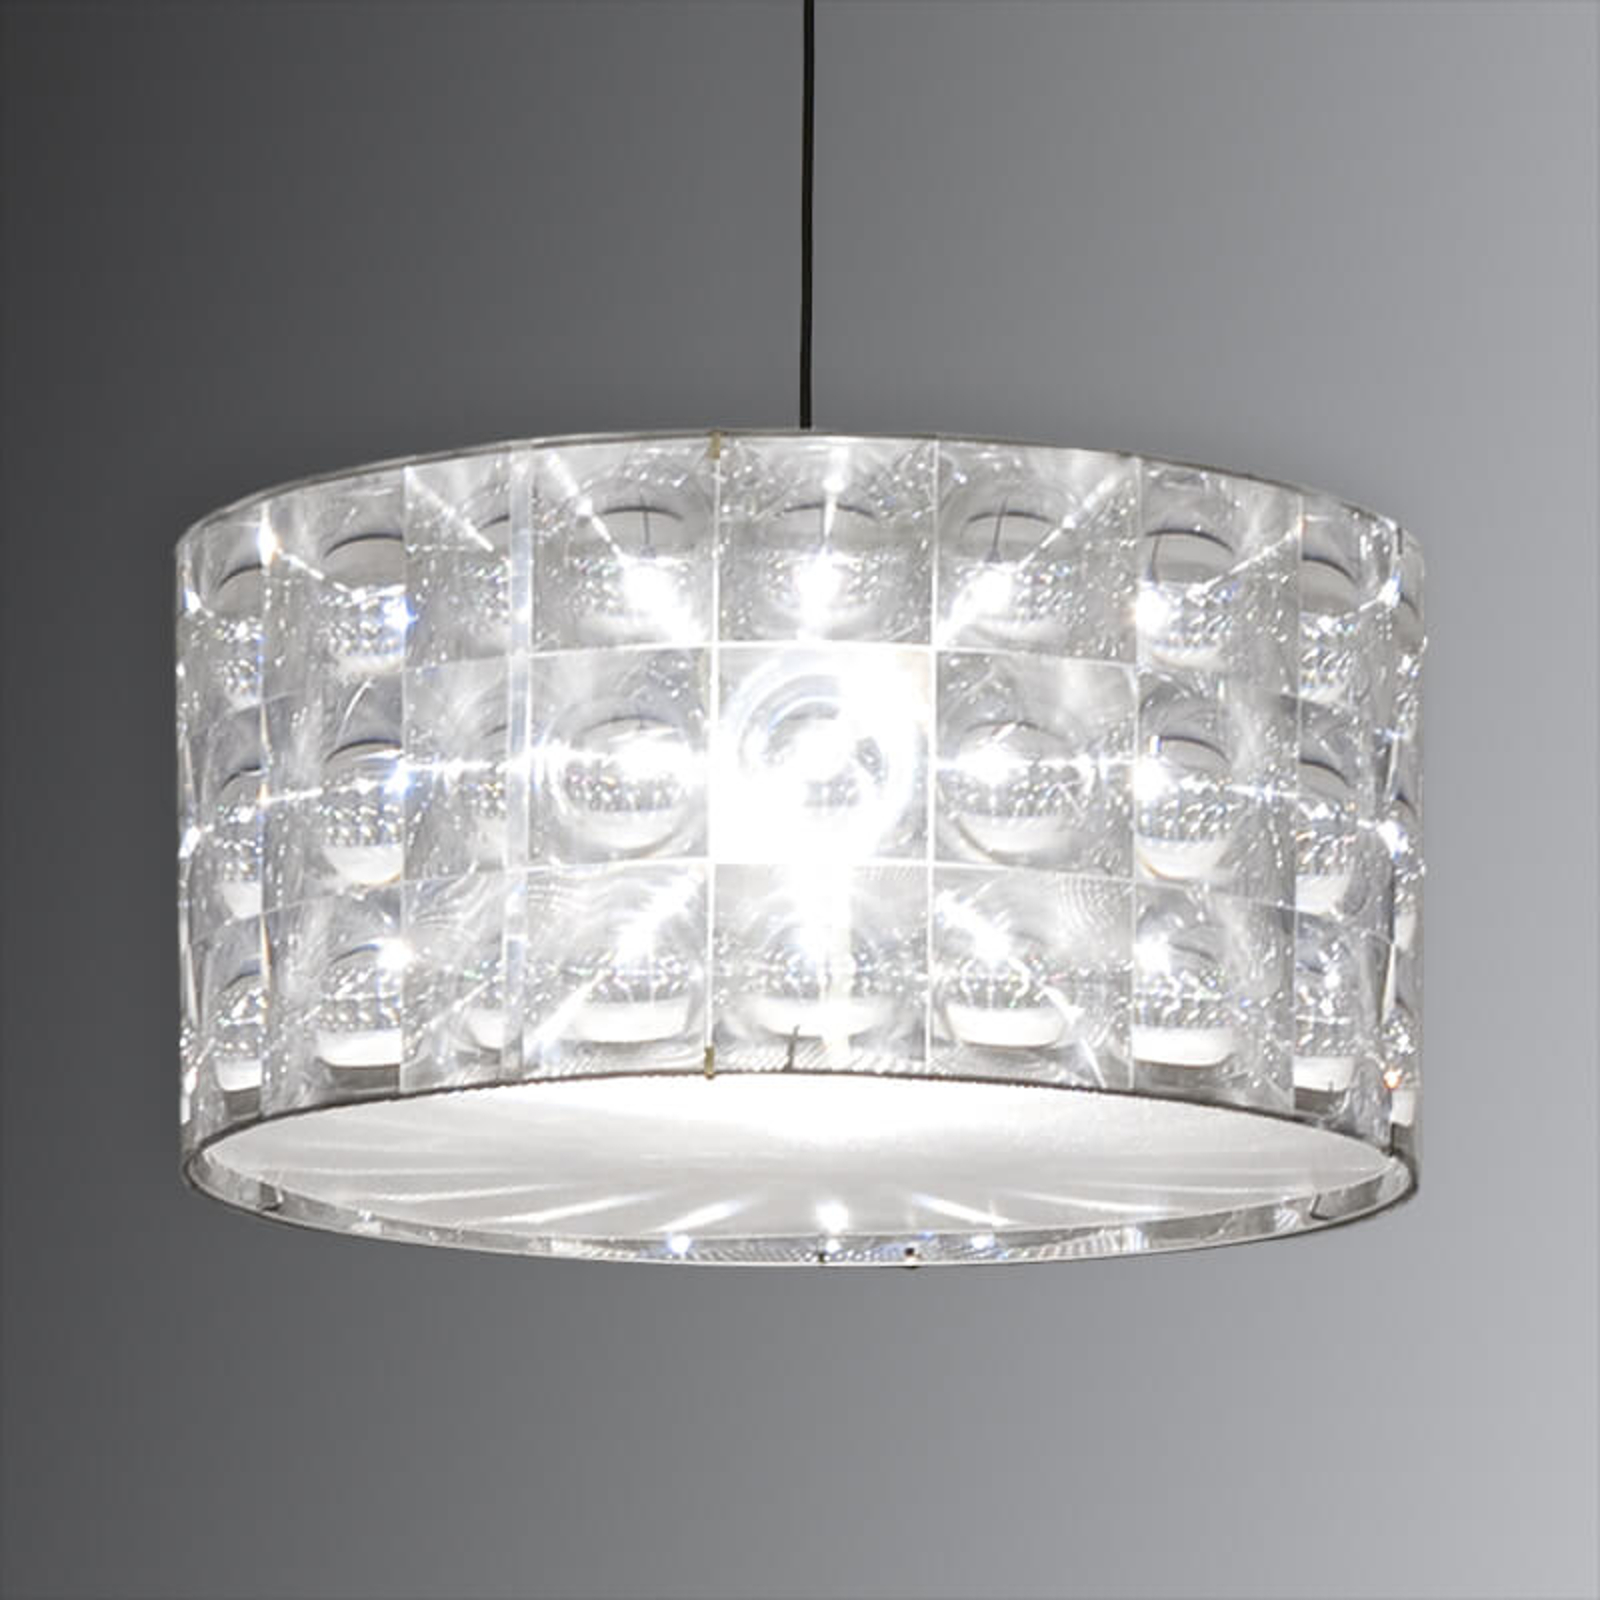 Innermost Lighthouse - design-hanglamp 46x30